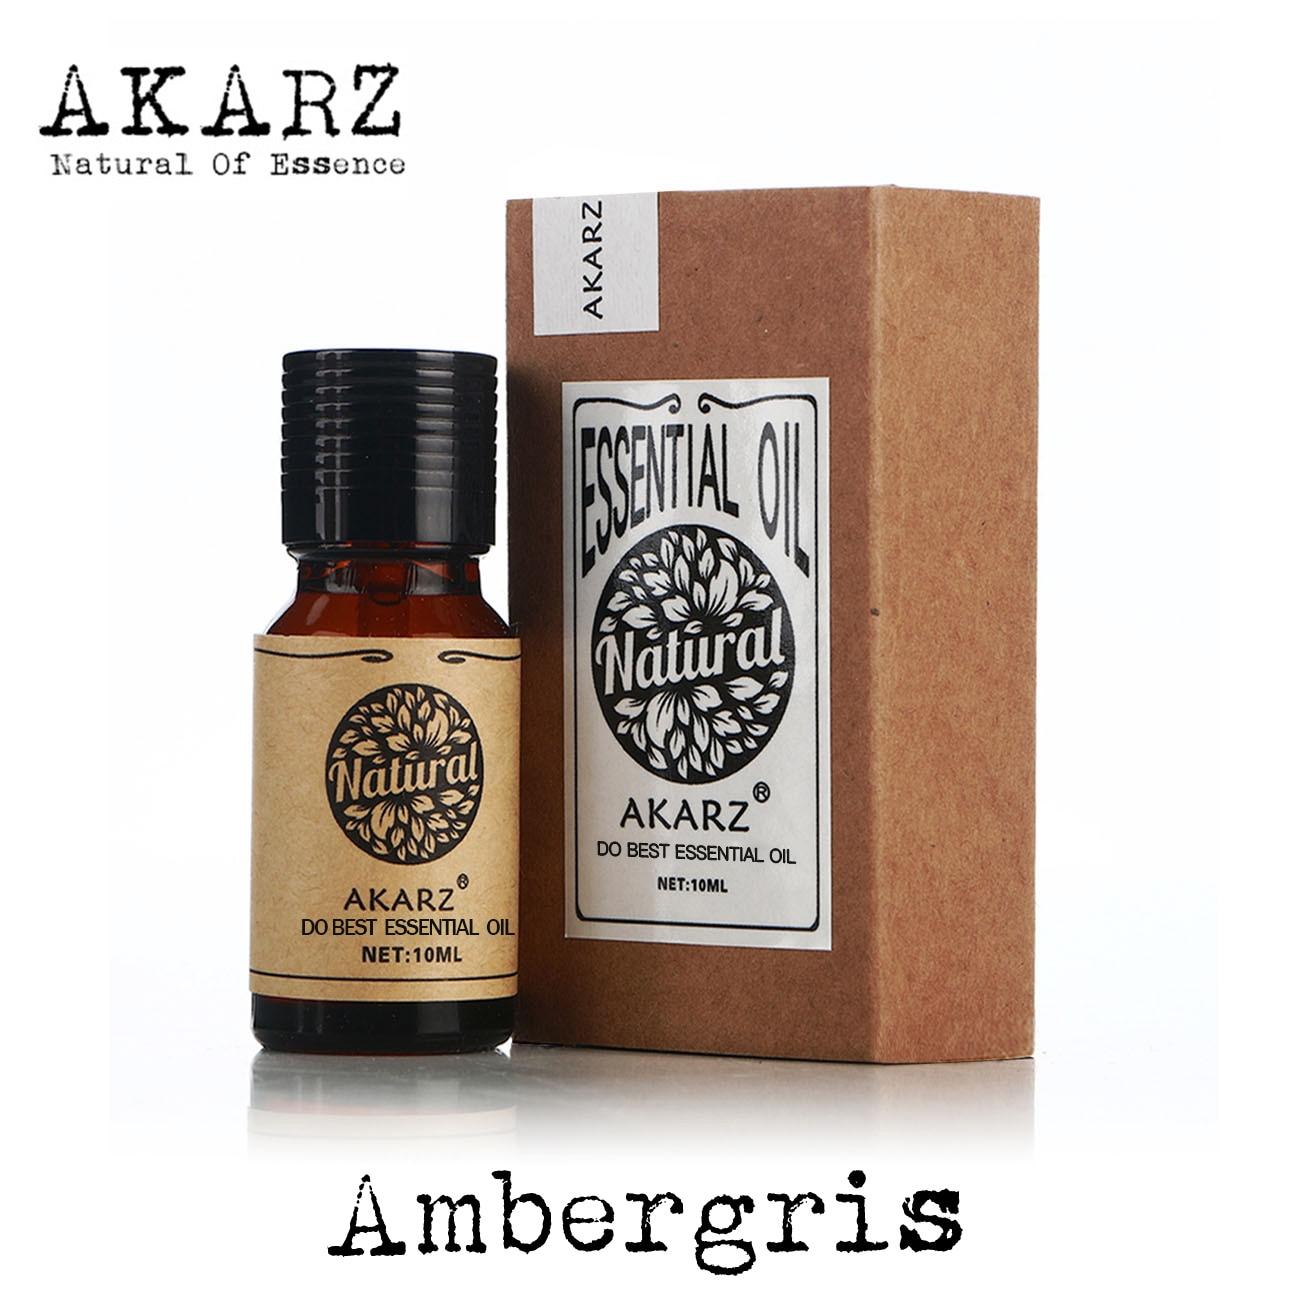 Akarz marca famosa natural aromaterapia ambergris óleo essencial perfume matérias-primas ambergris óleo